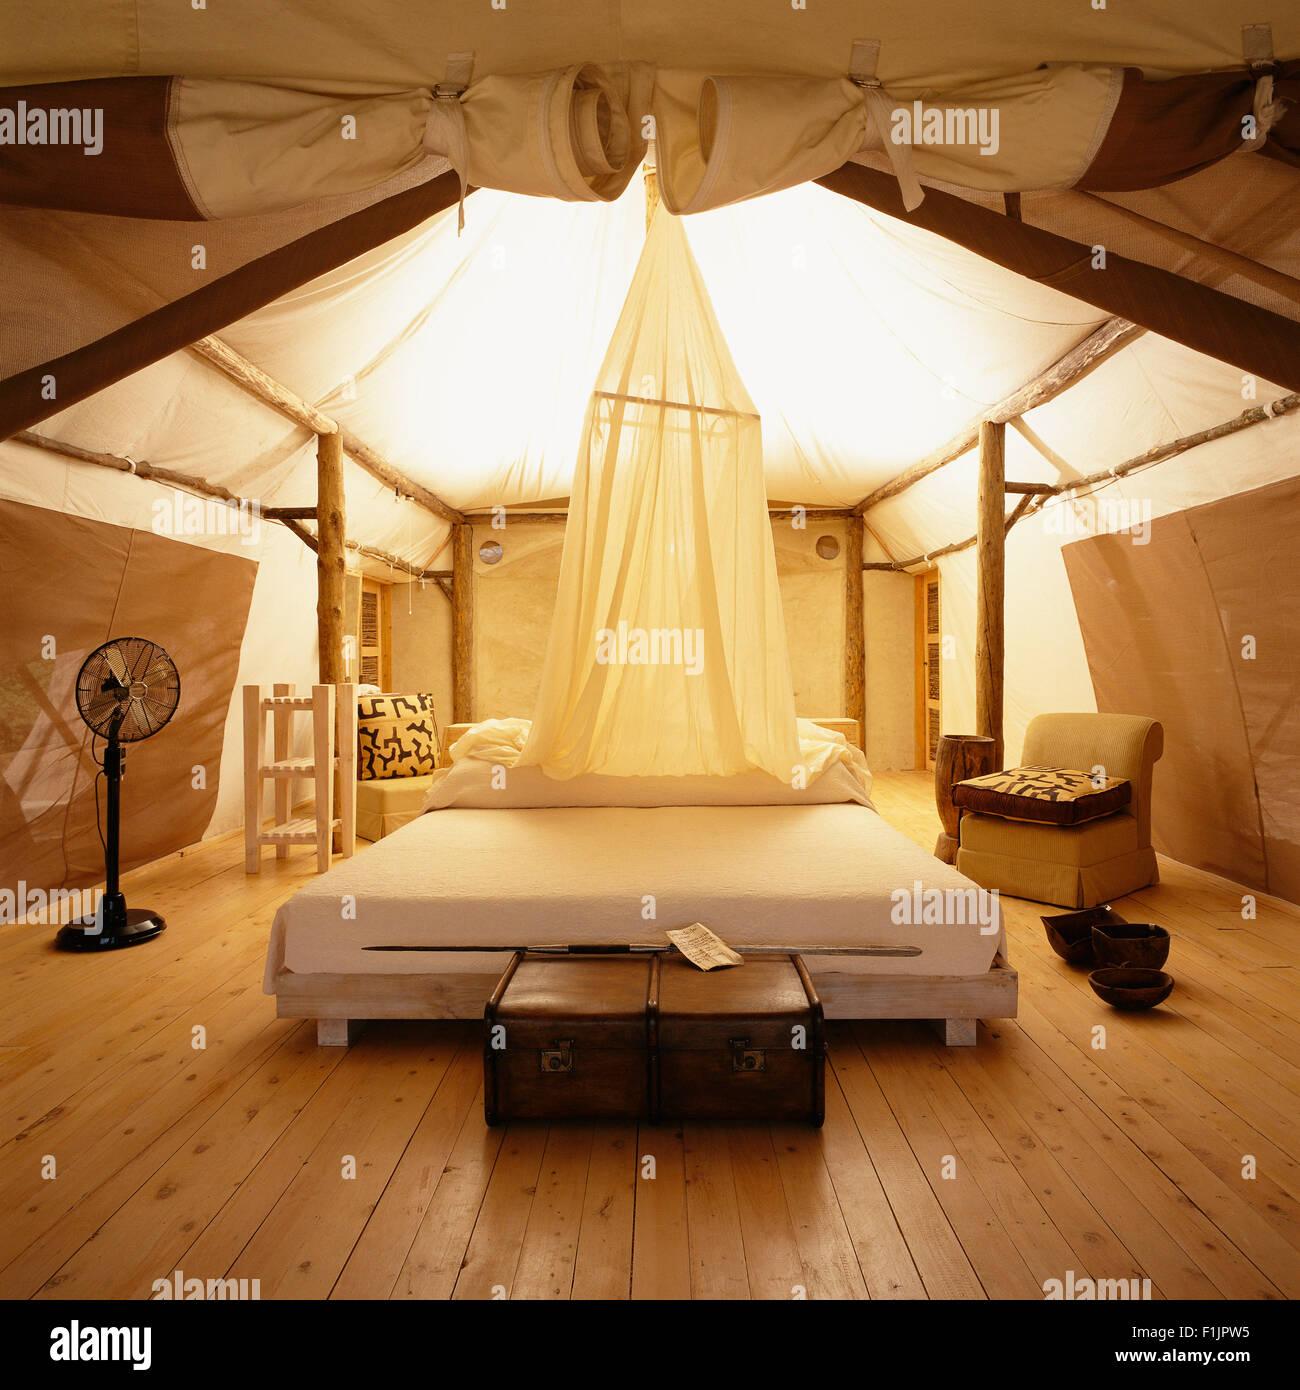 Interior of Hotel Room at Lake Manyara Tree Lodge, United Republic of Tanzania, Africa - Stock Image